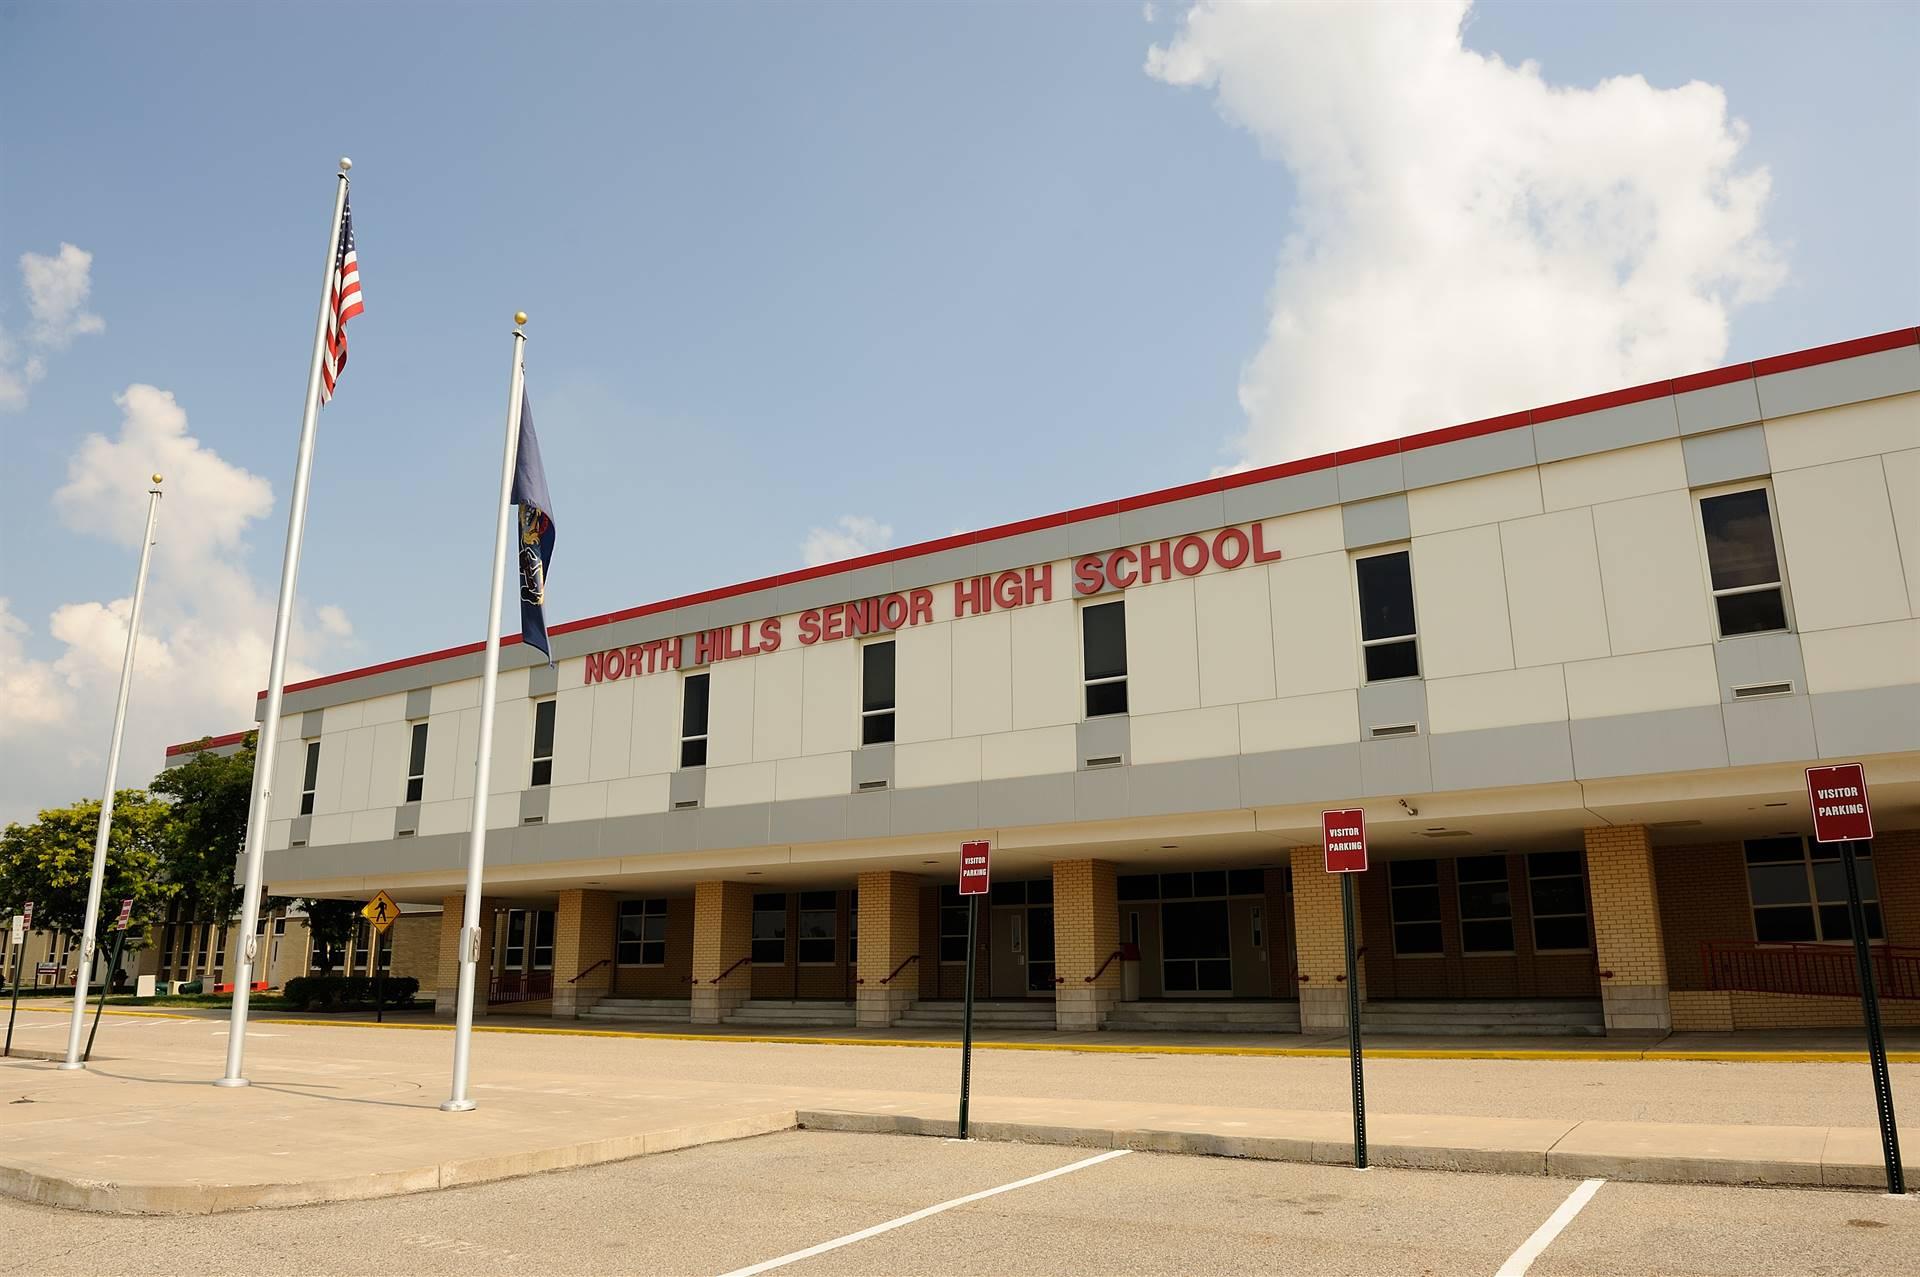 North Hills Senior High School